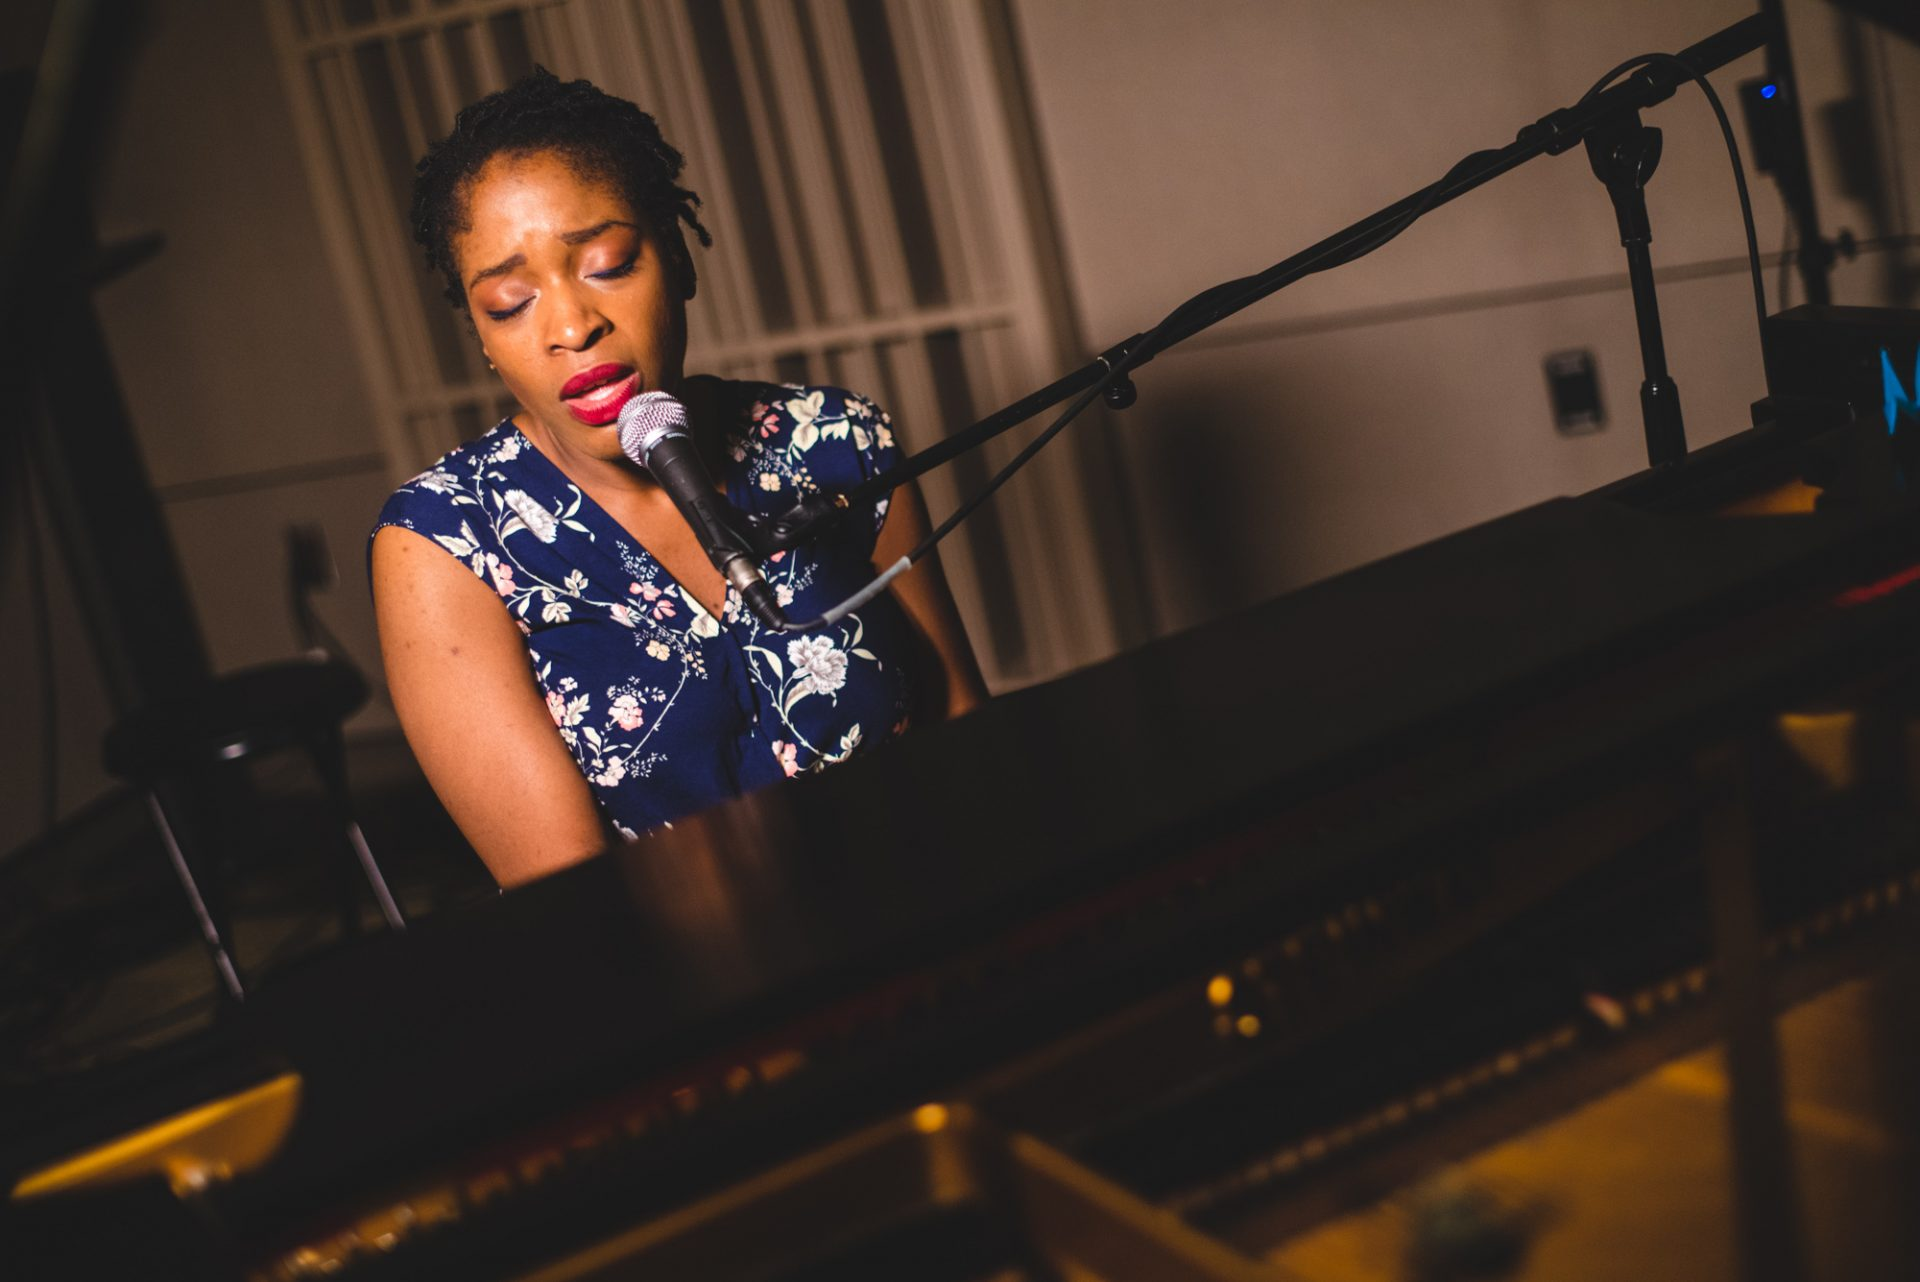 Joy Ike playing piano and singing